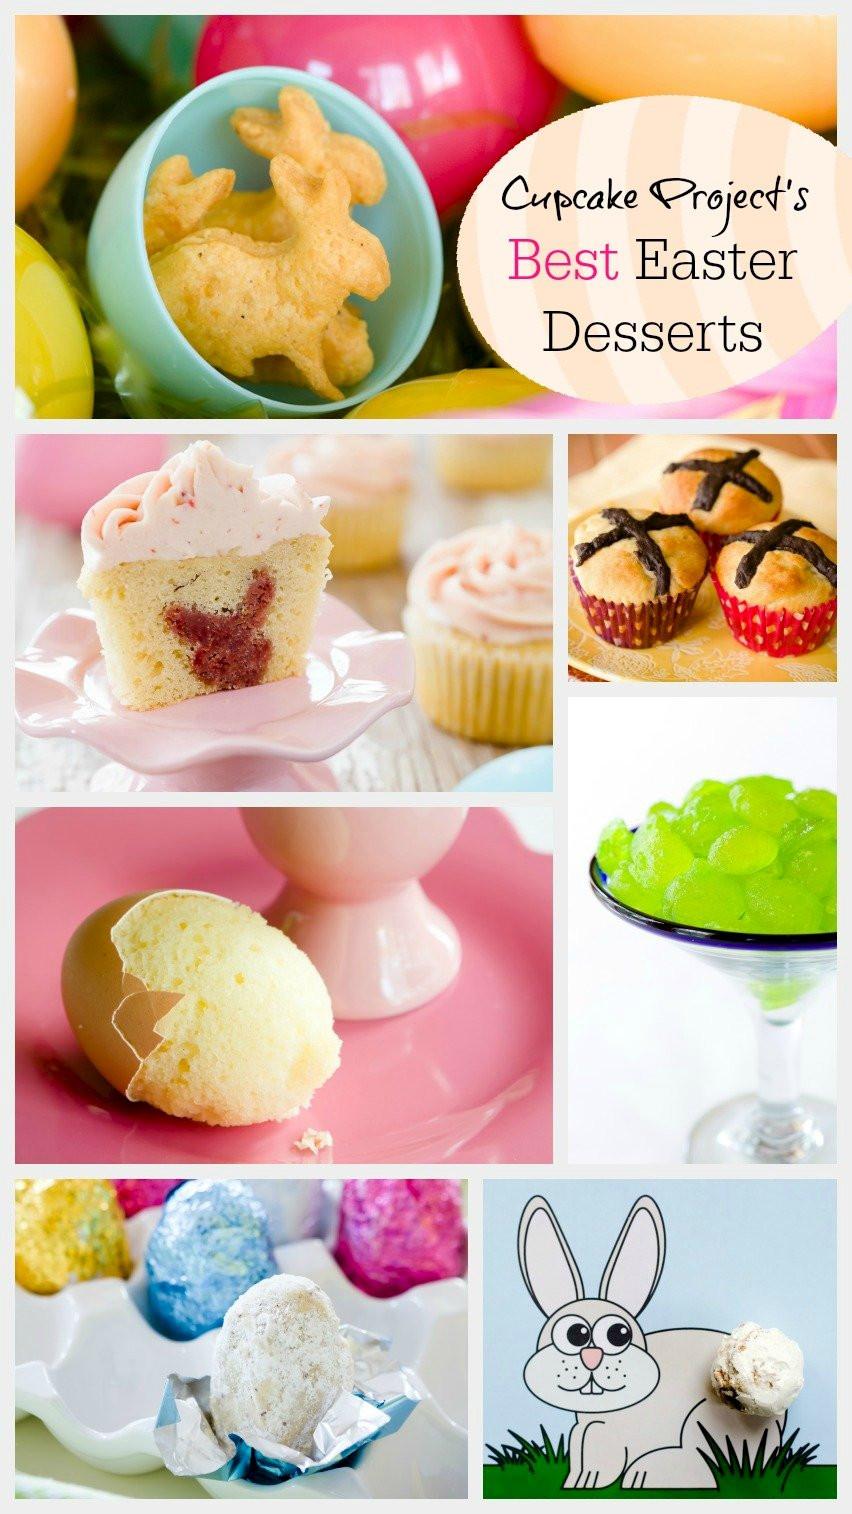 Best Easter Desserts  My Best Easter Dessert Ideas